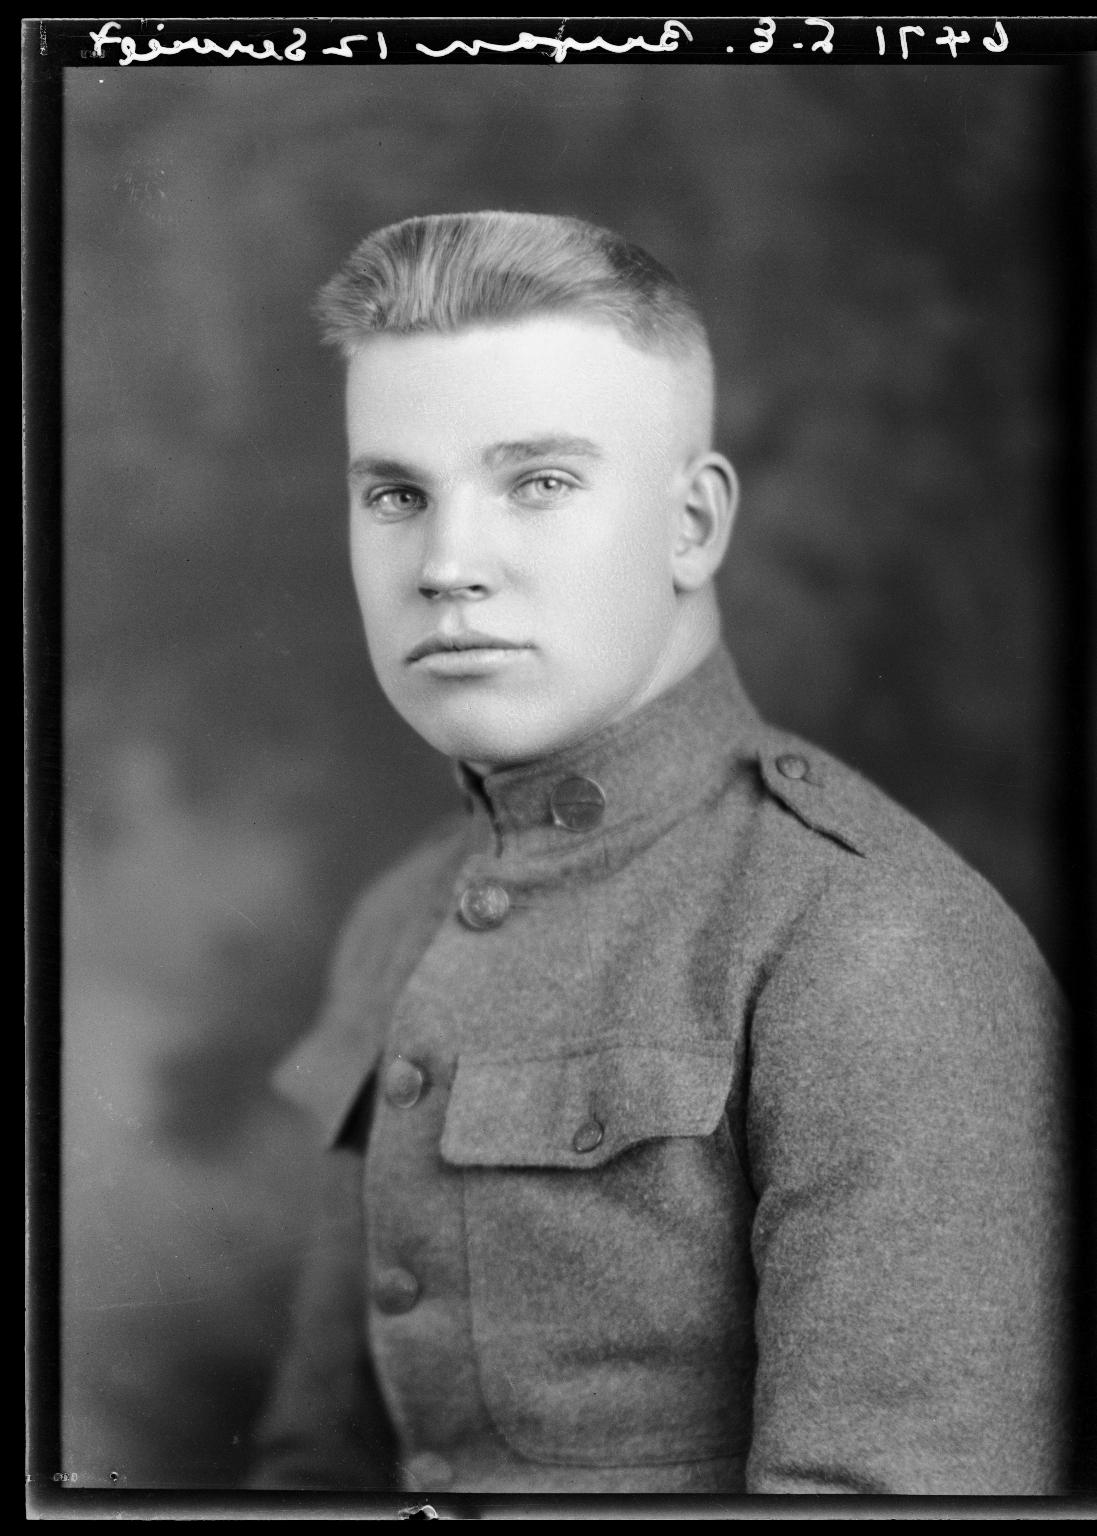 Portraits of L. E. Bryan